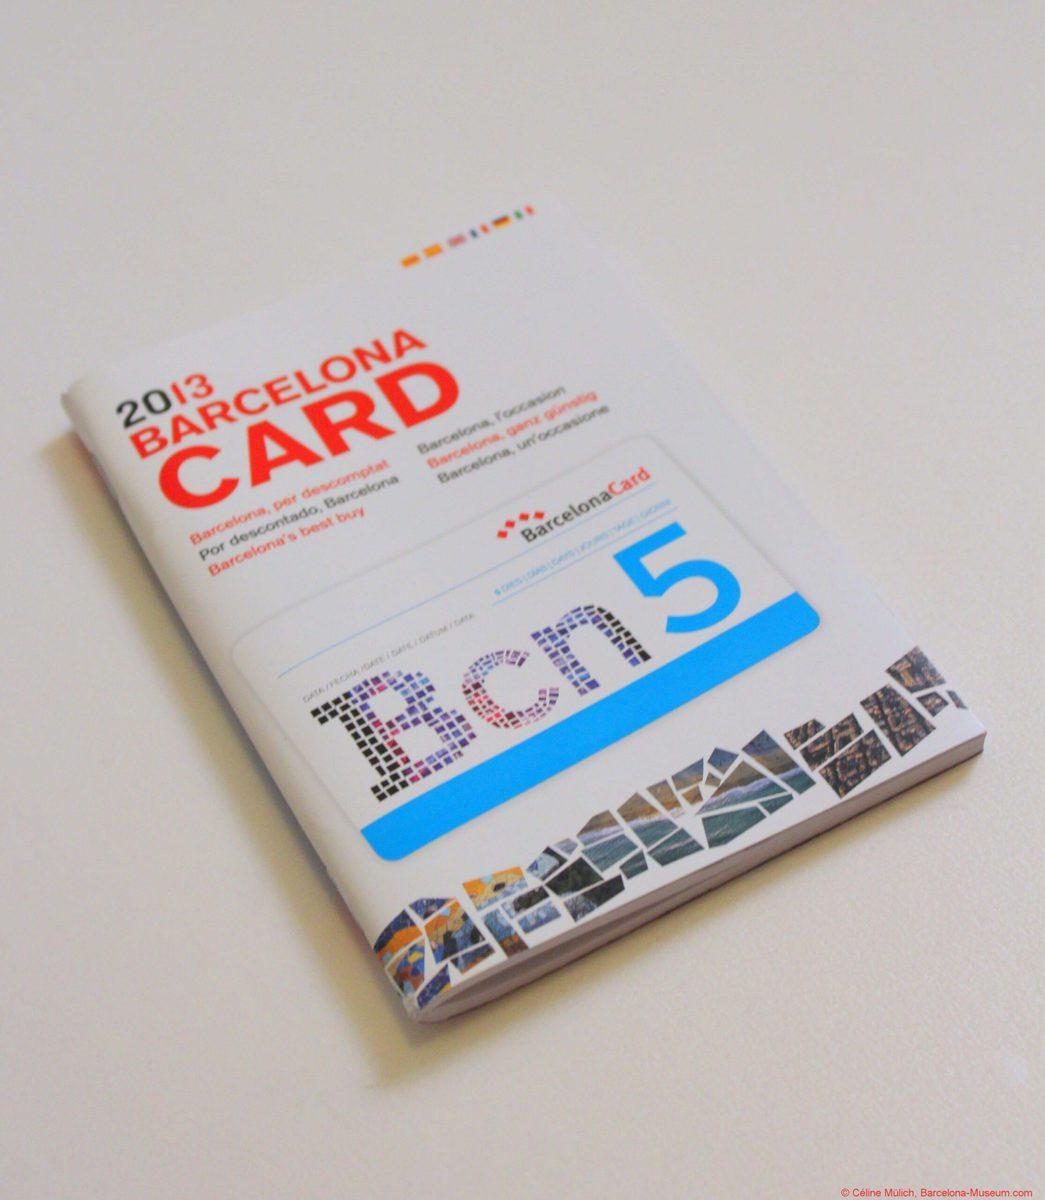 Barcelona Card 5 Tage